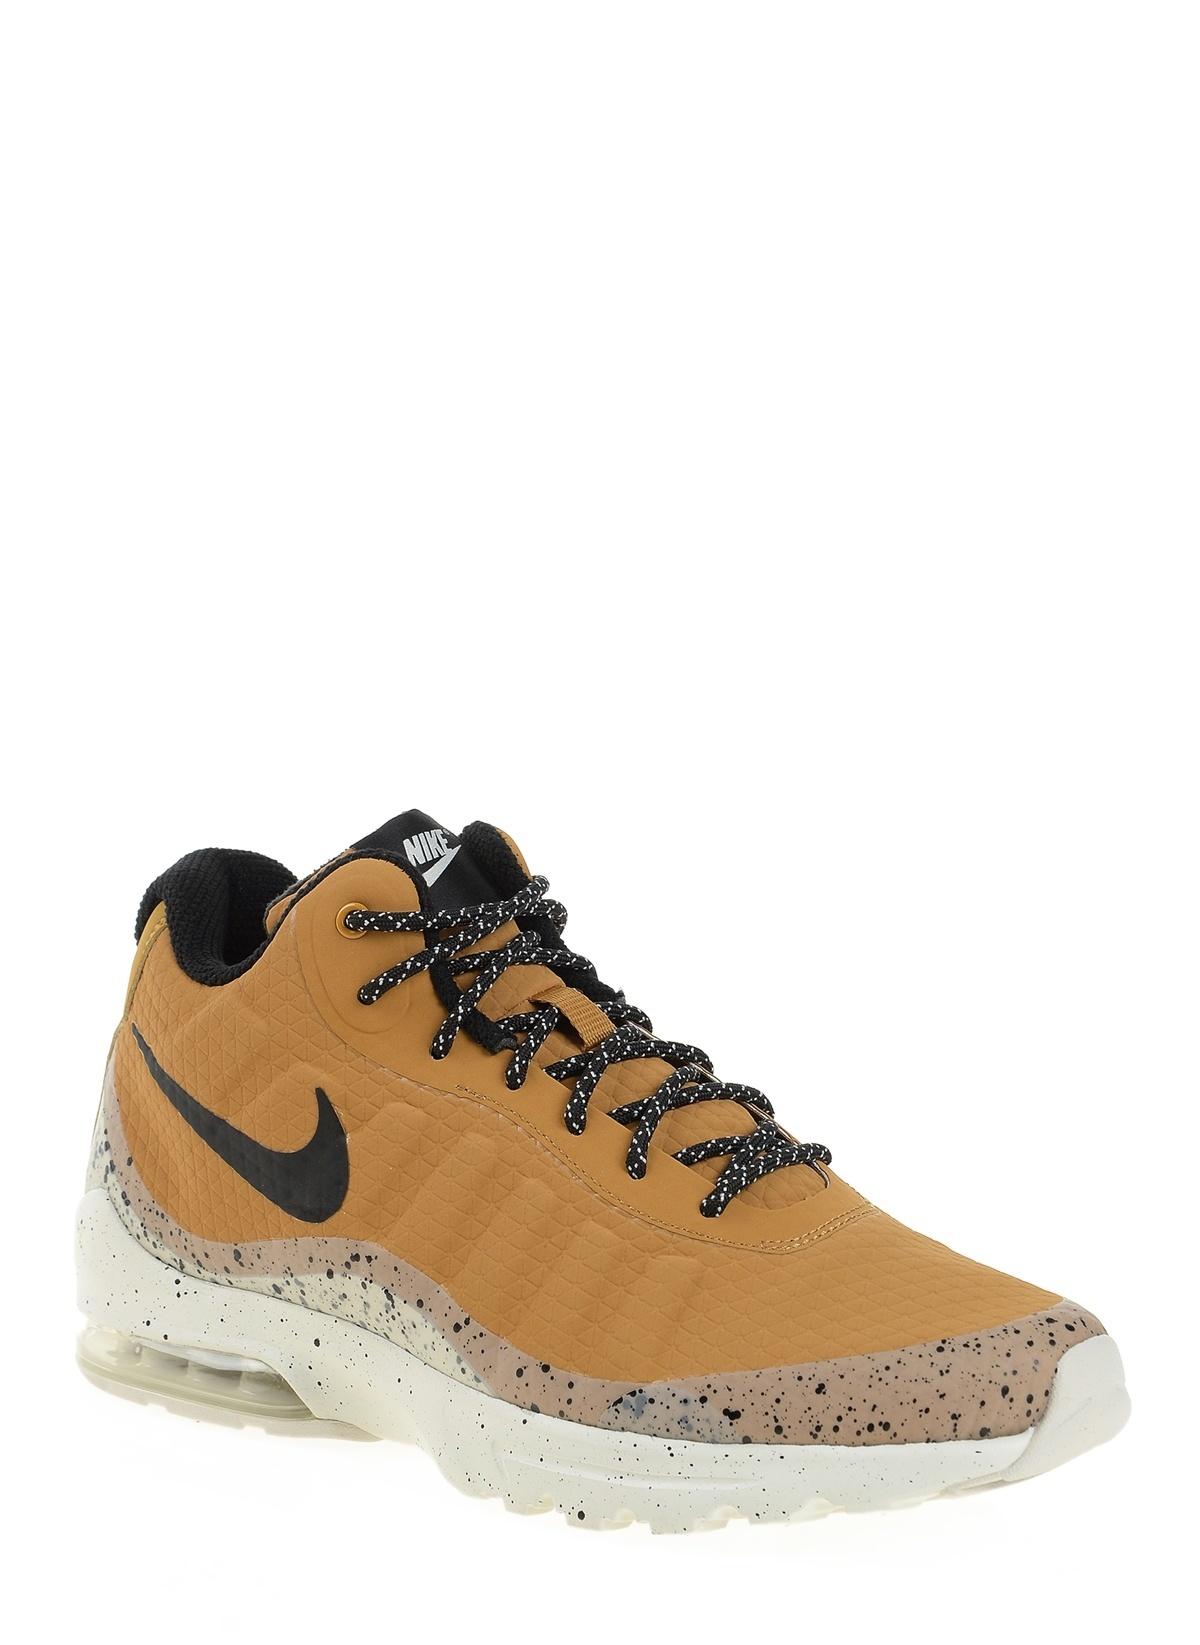 0d96543130c Nike Erkek Air Max Invigor Mid Wheat Black-Light Bone İndirimli ...